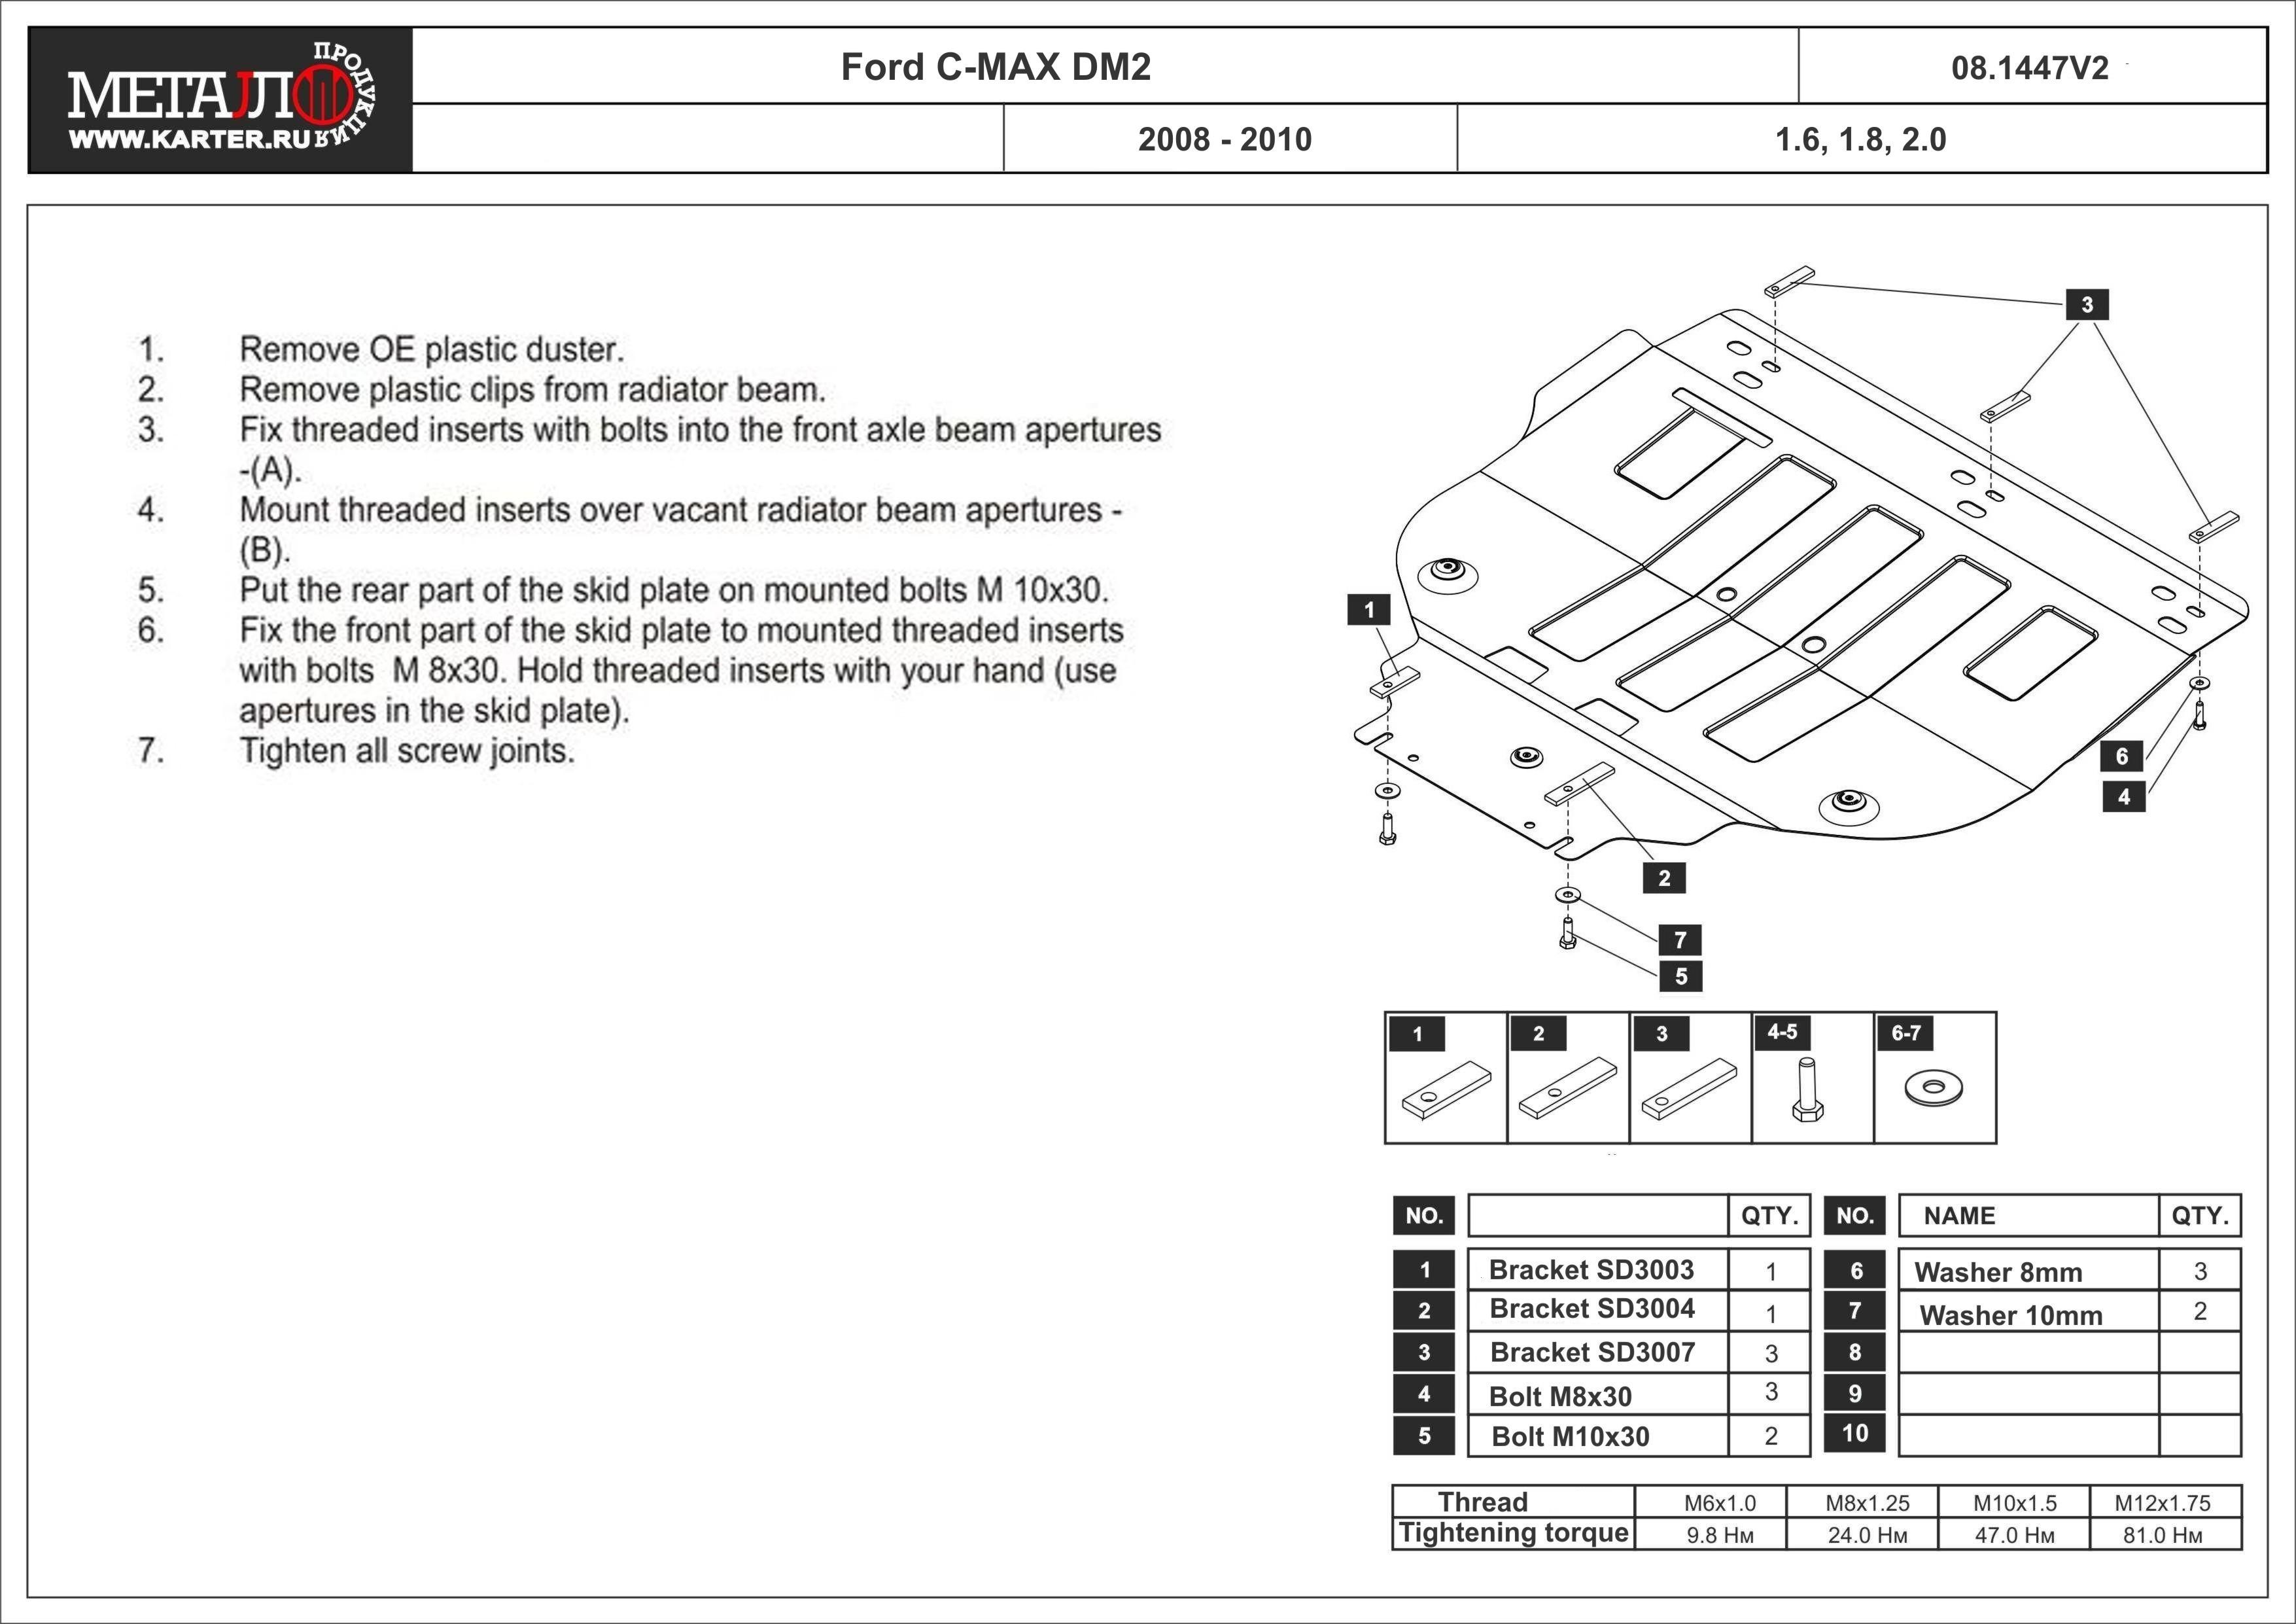 Ford 6 0 Engine Diagram 2 ford Of Ford 6 0 Engine Diagram 2